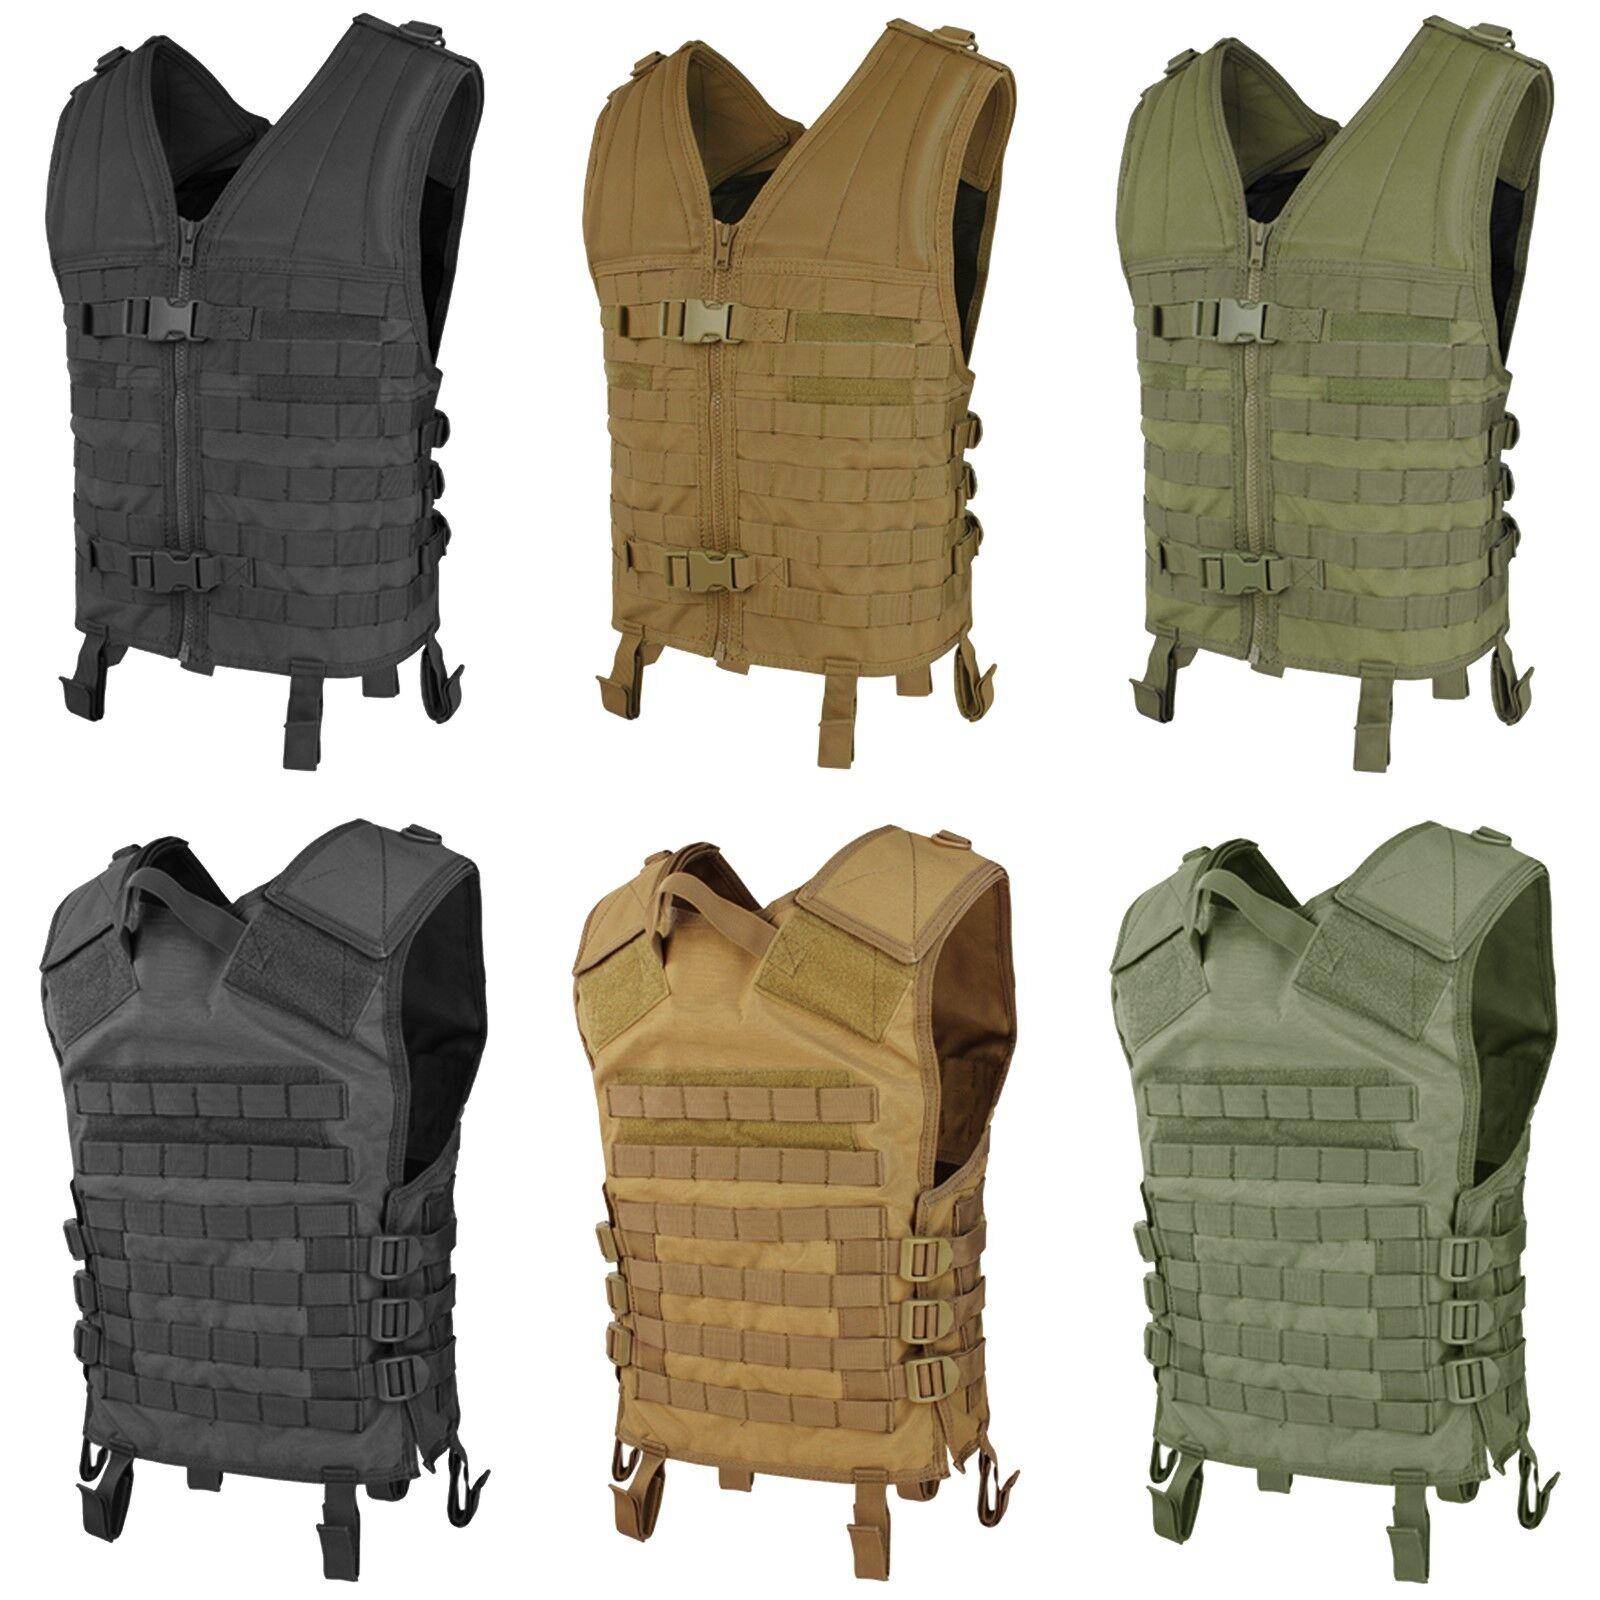 CONDOR MV-001 Modular Style Vest OD